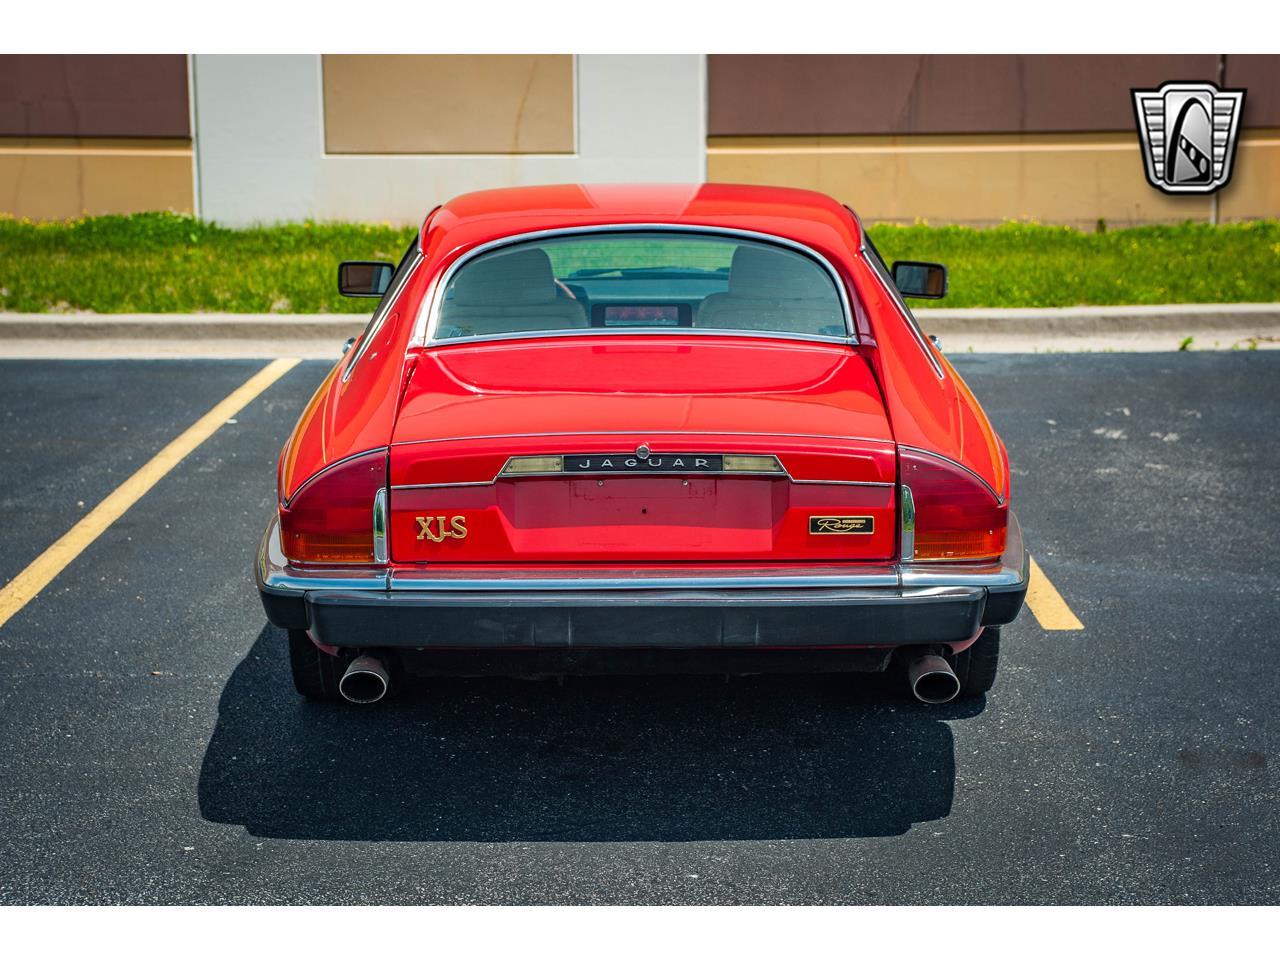 Large Picture of '89 Jaguar XJS - $20,000.00 Offered by Gateway Classic Cars - St. Louis - QB9L